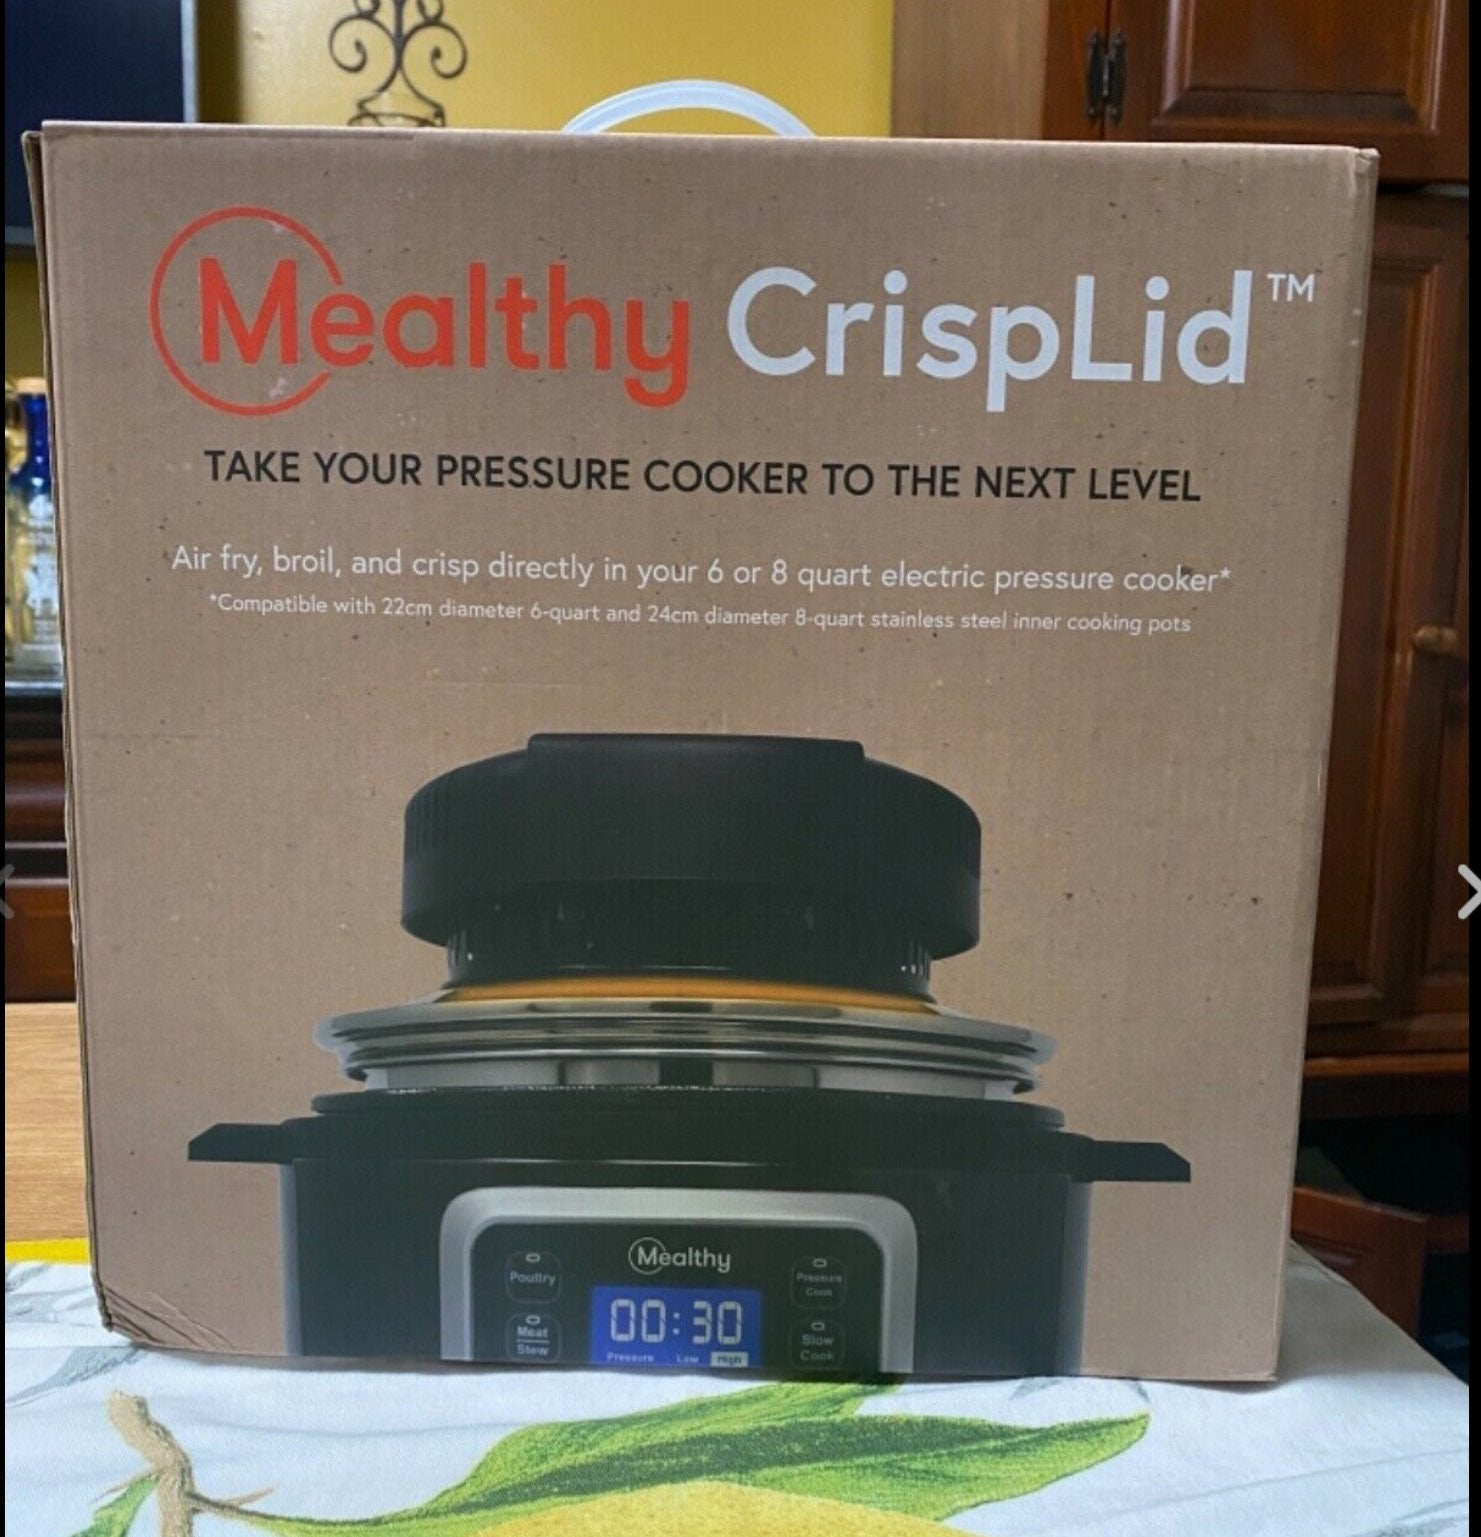 New inBox Mealthy Crisplid